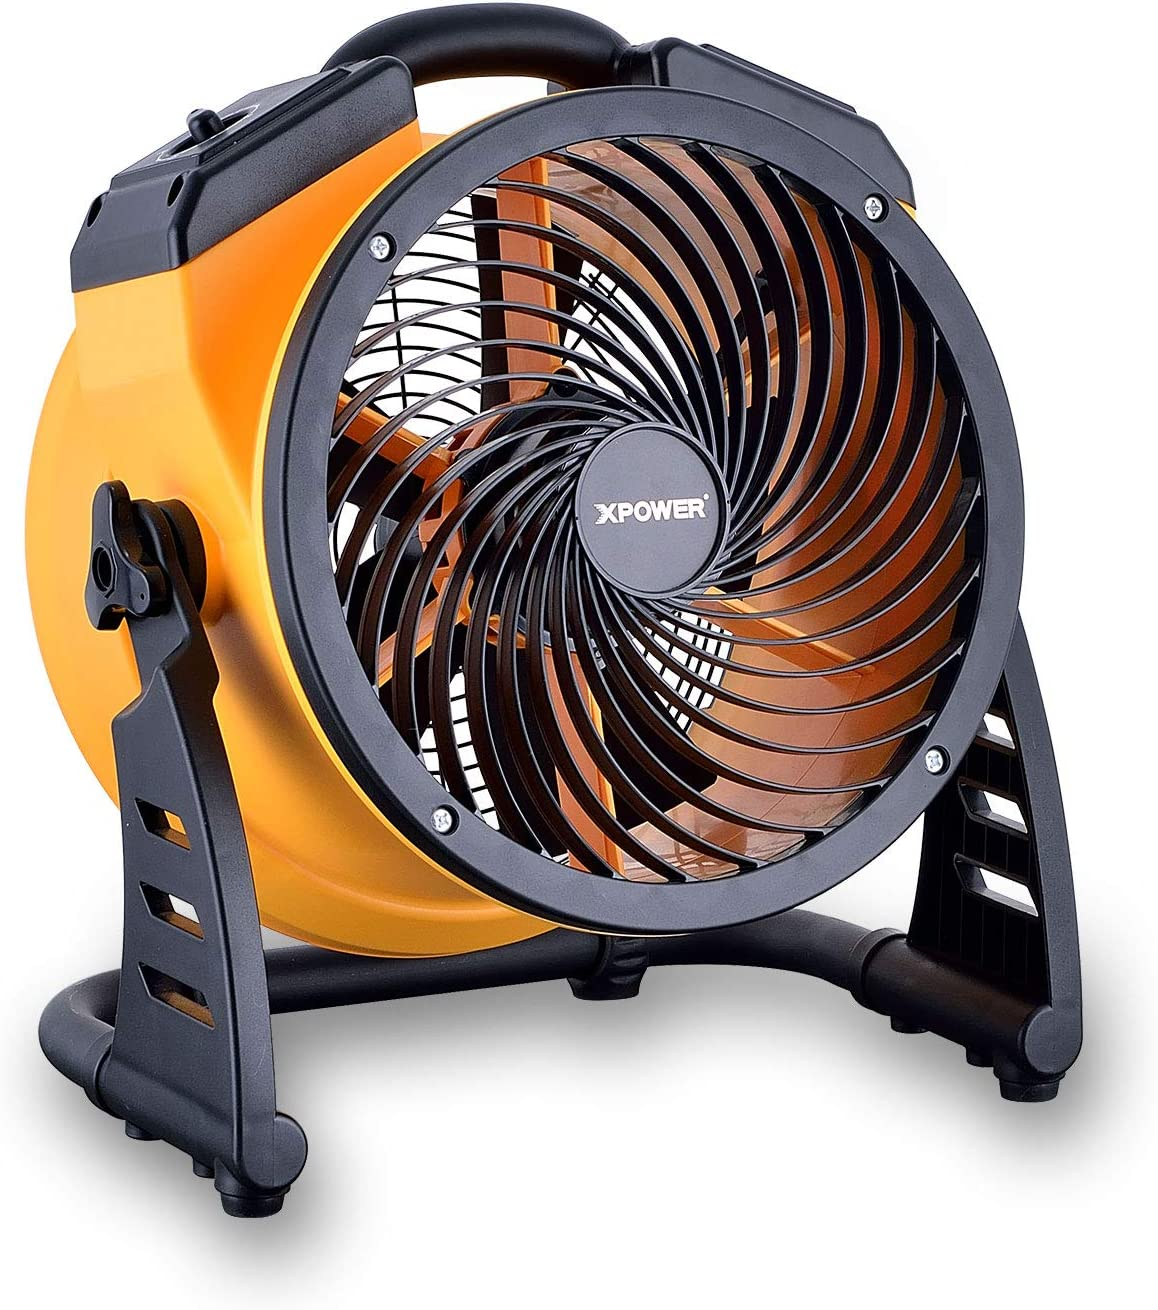 XPower Max 52% OFF FC-100 Axial Fan Carpet Luxury Dryer Blower Air Utility Floor Ci